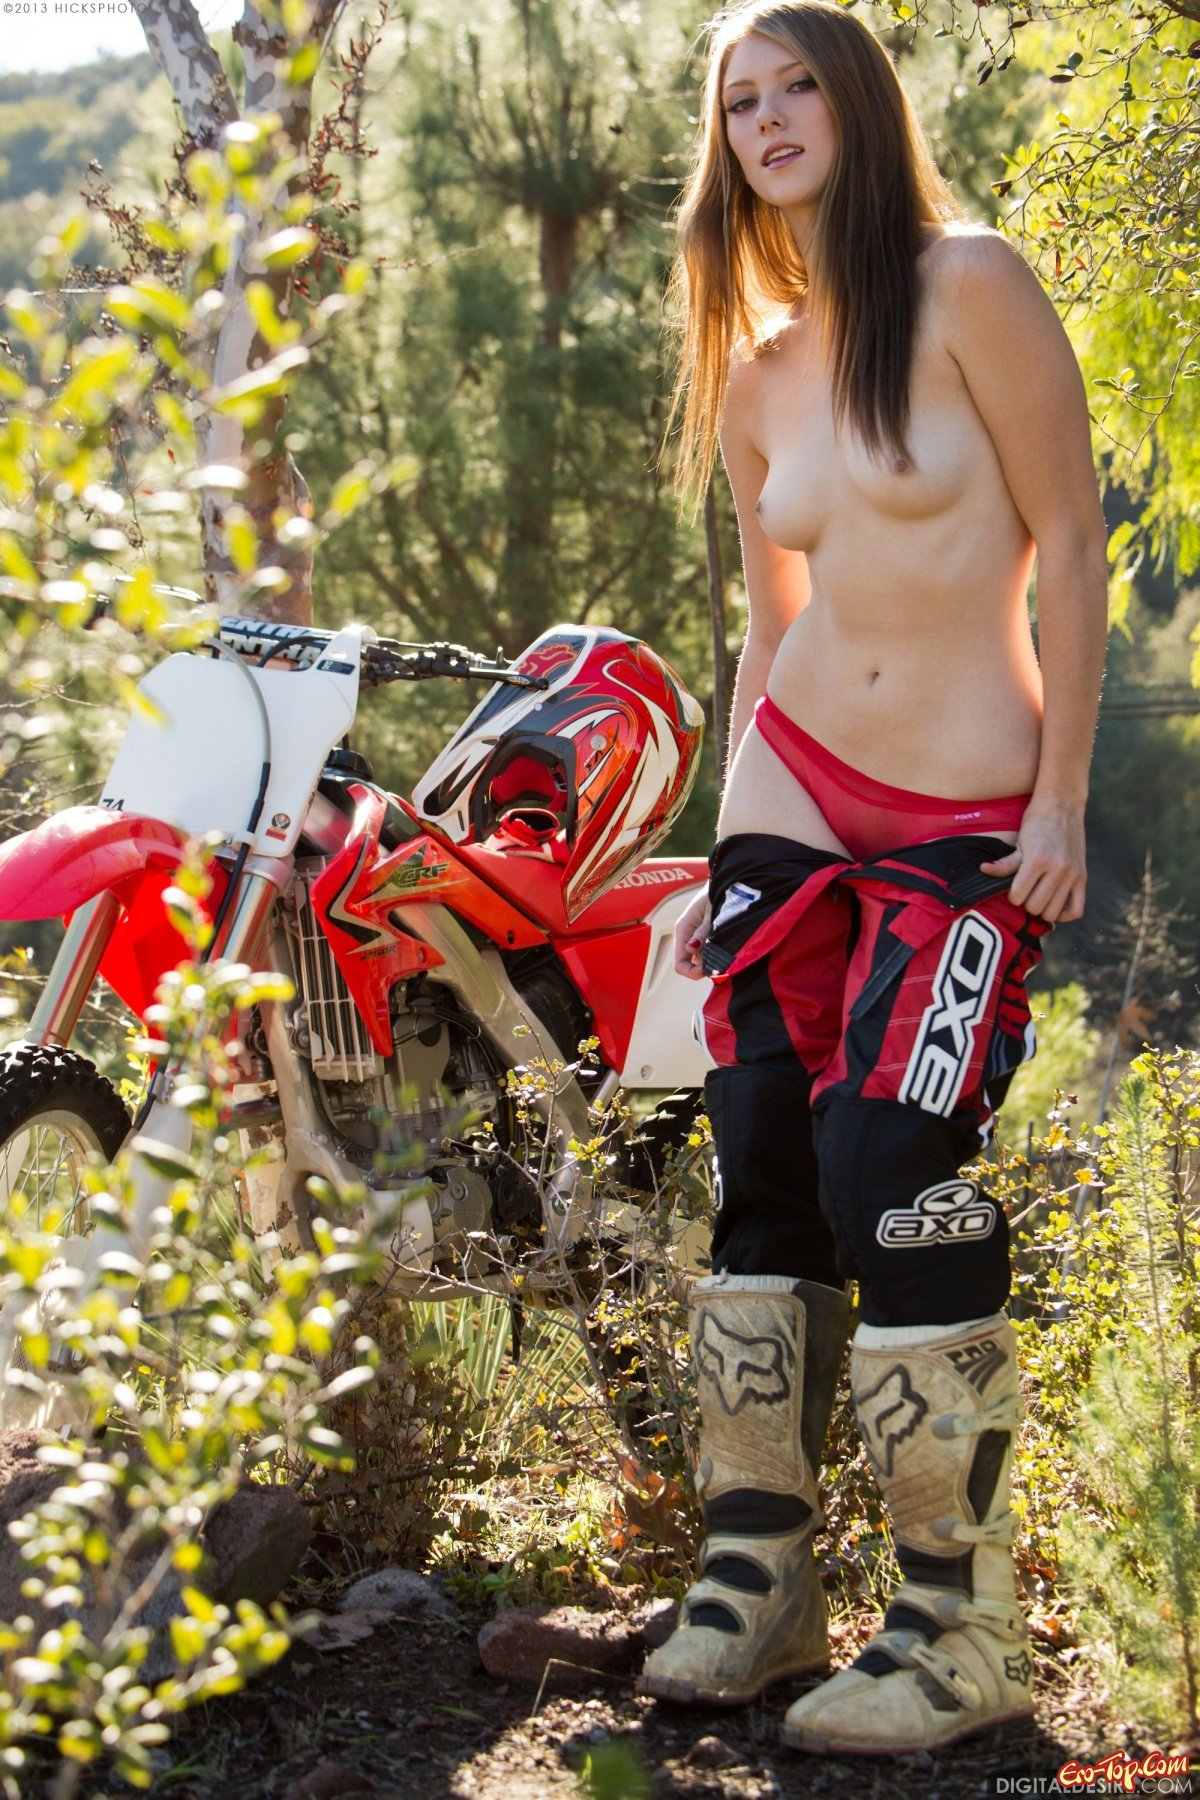 naked-girl-riding-a-dirt-bike